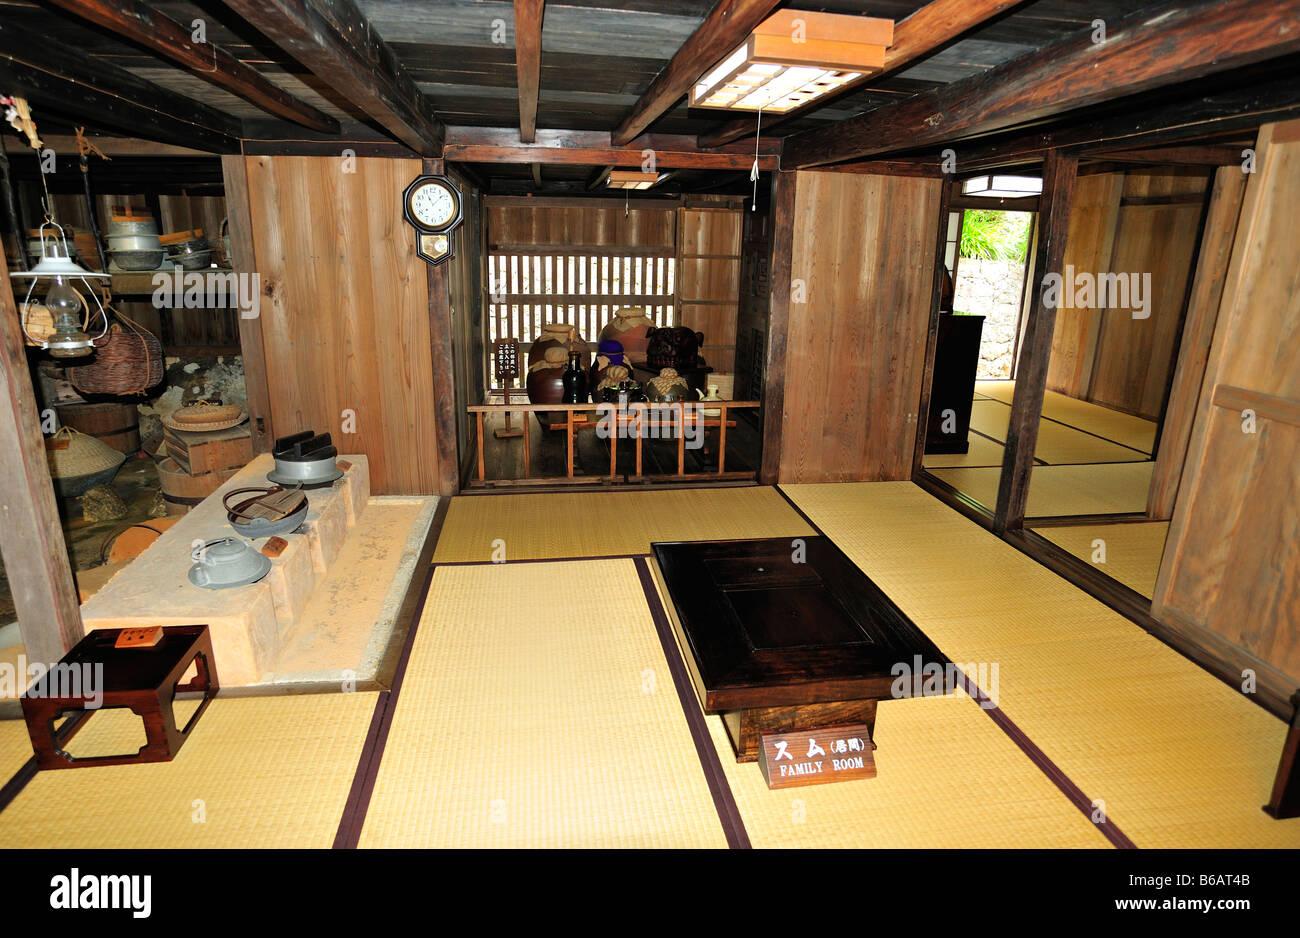 nakamura house, nakagusuku, nakagami district, okinawa, japan - Stock Image